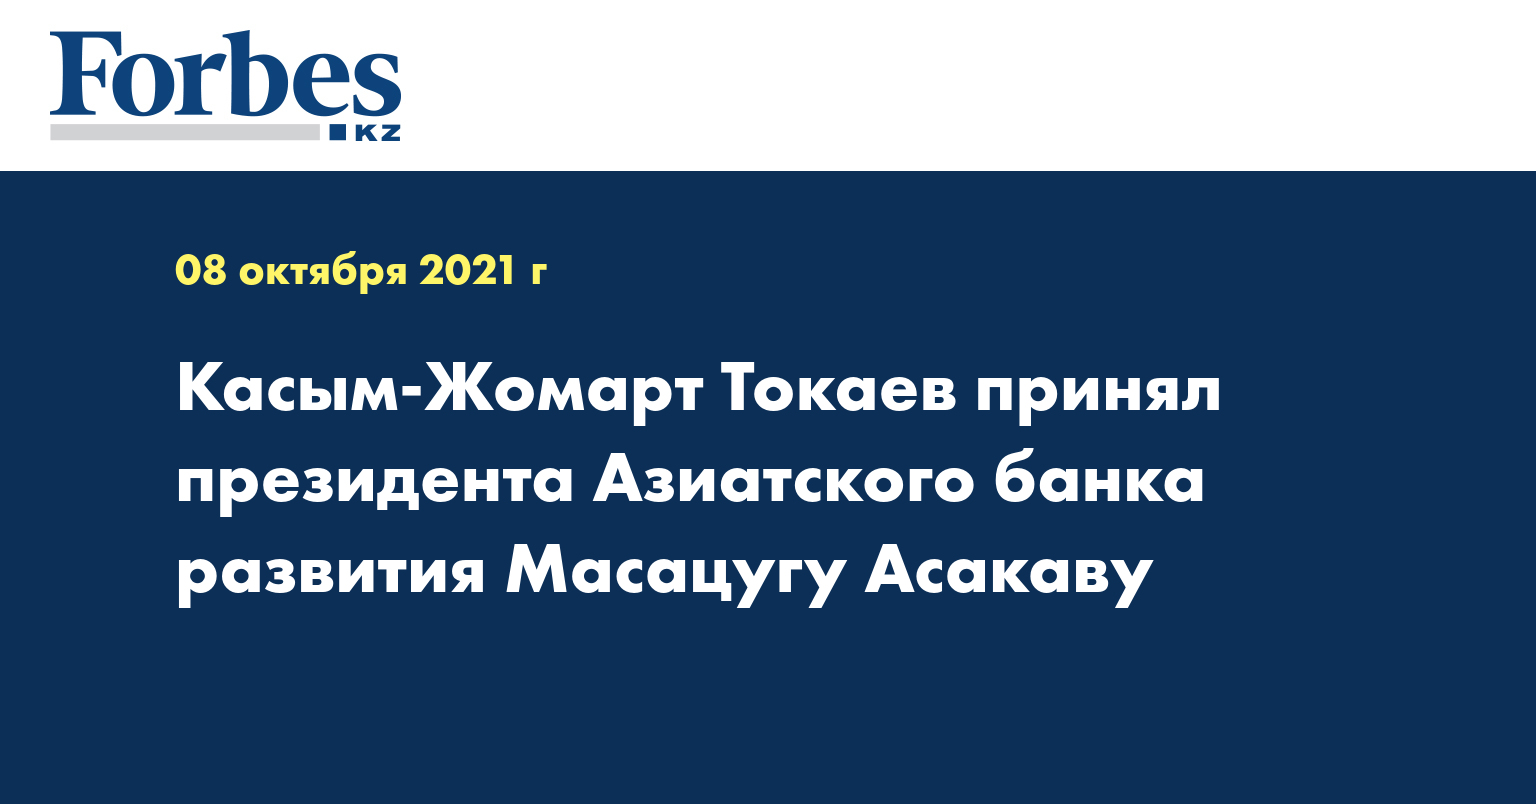 Касым-Жомарт Токаев принял президента Азиатского банка развития Масацугу Асакаву